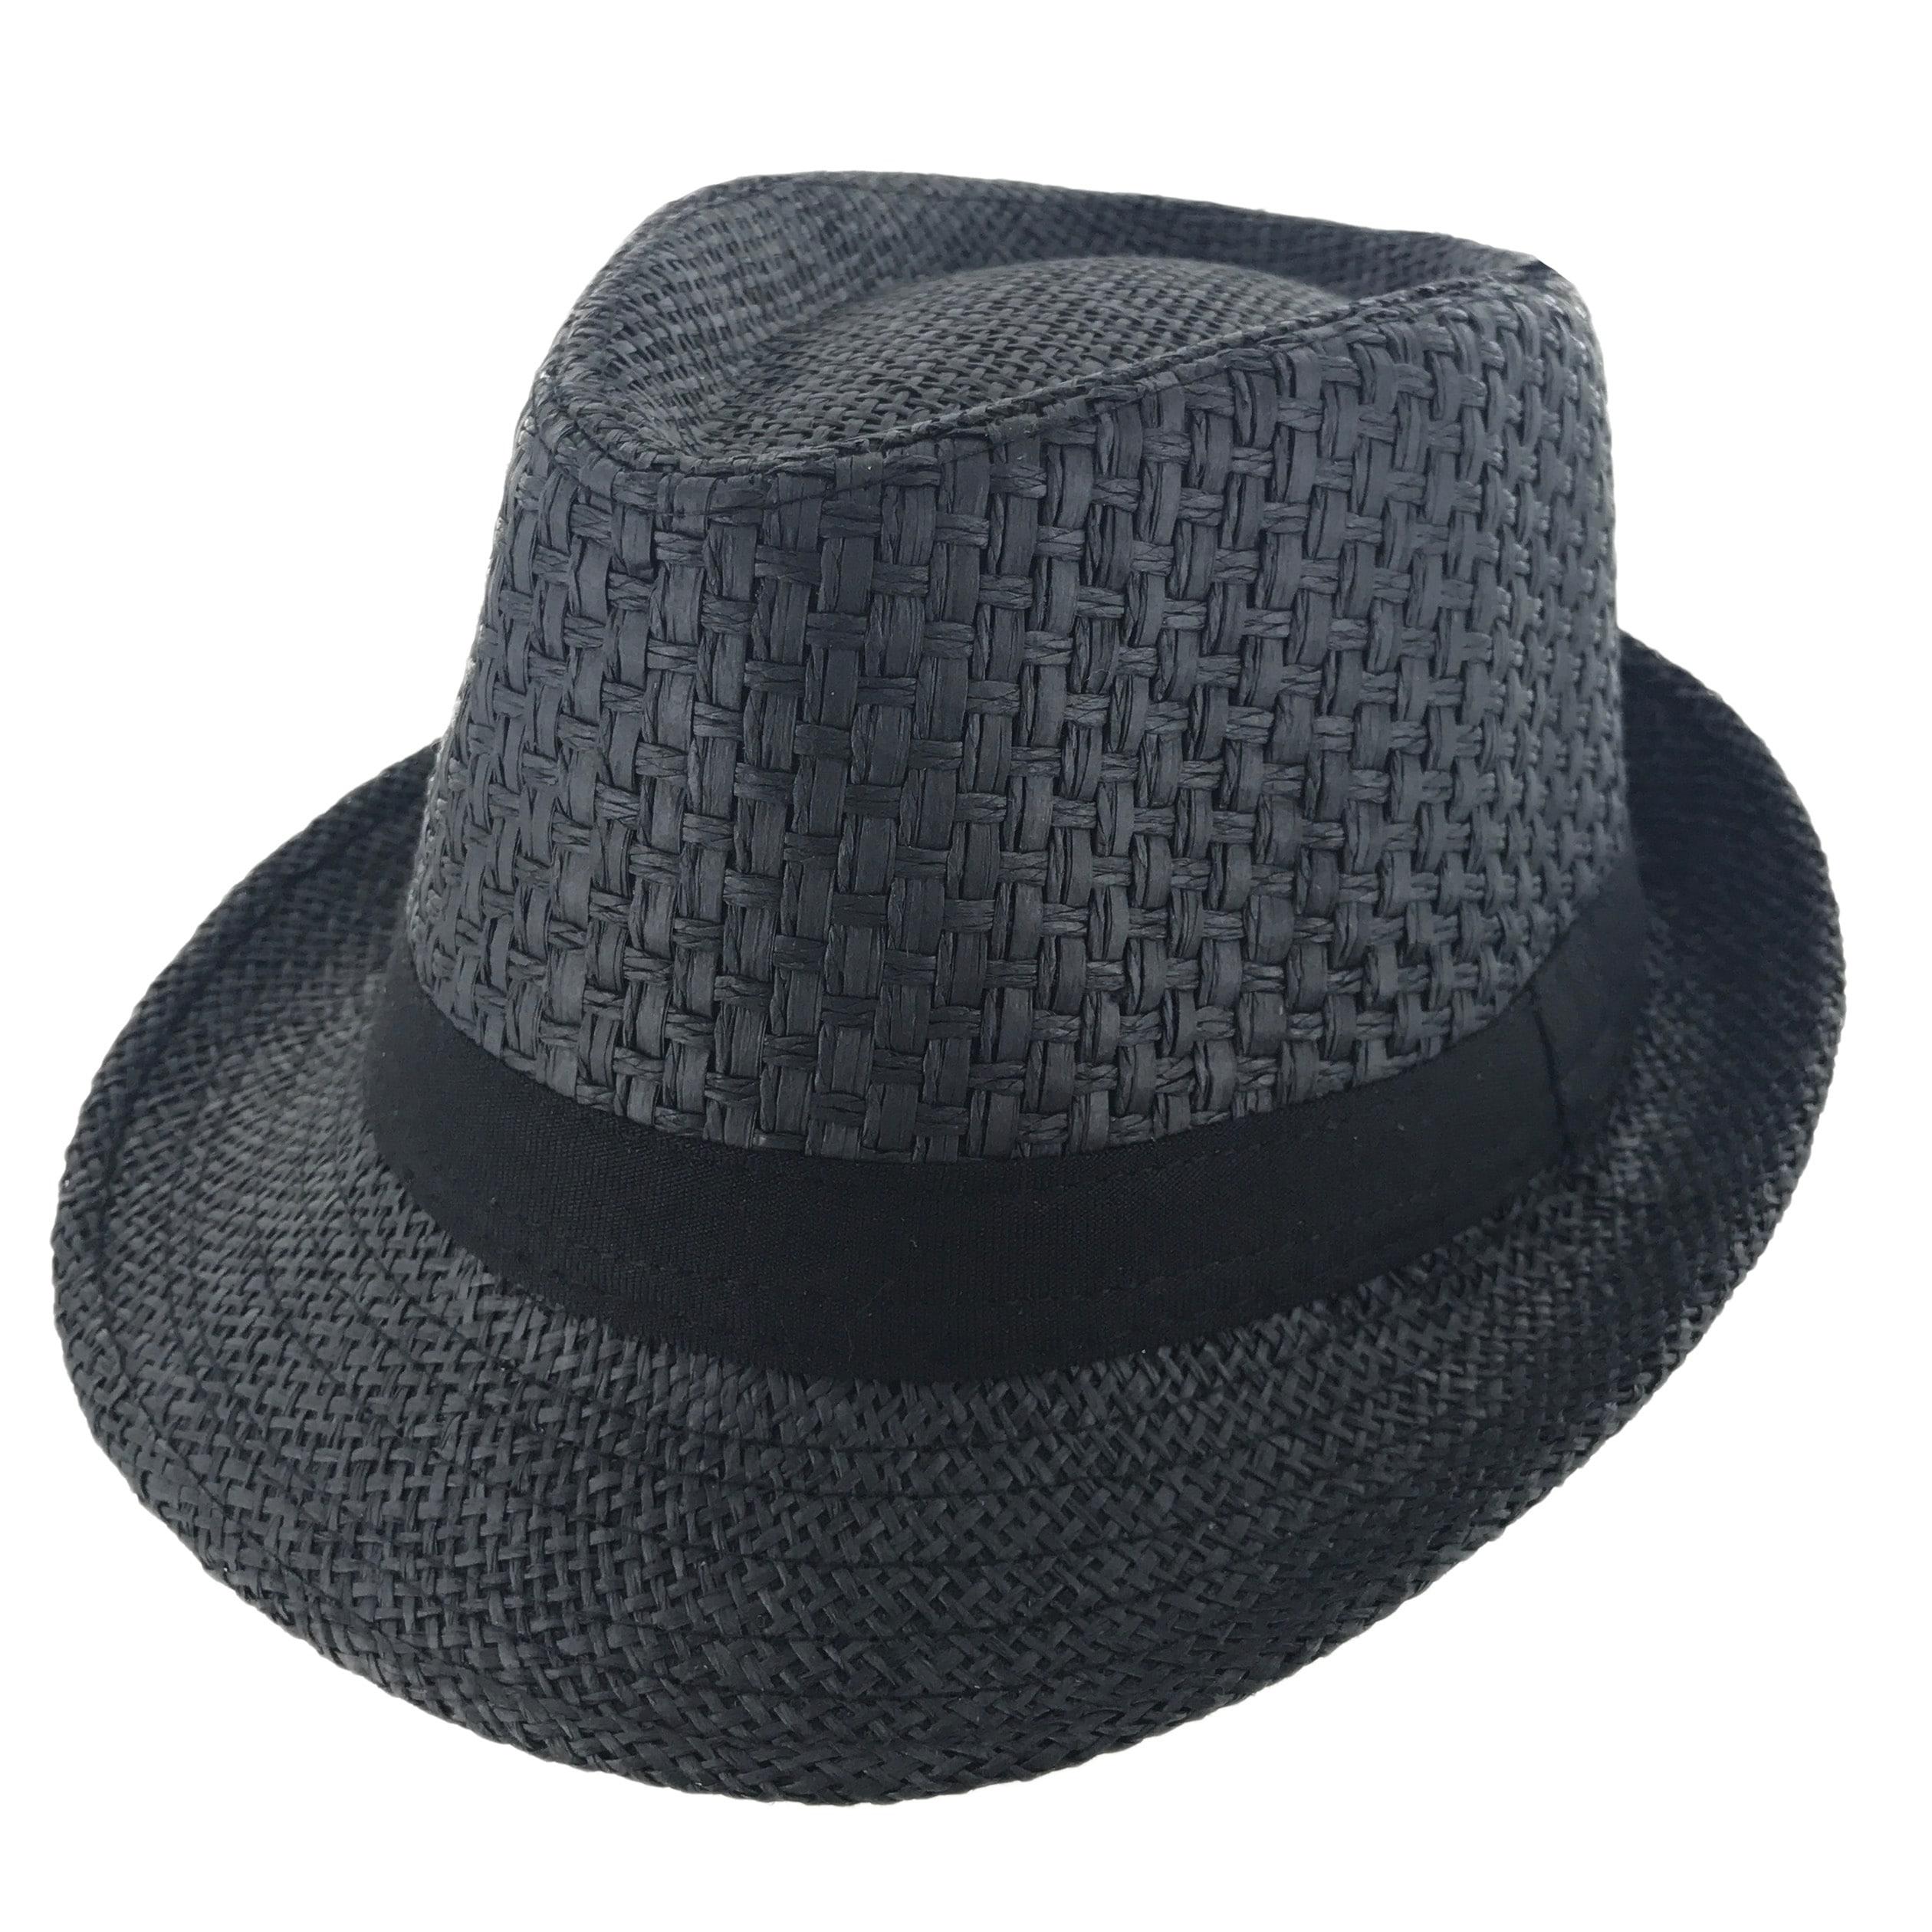 499f1fad6df Details about Faddism Unisex Ribbon Cuban Brim Fedora Straw Hat Model 214